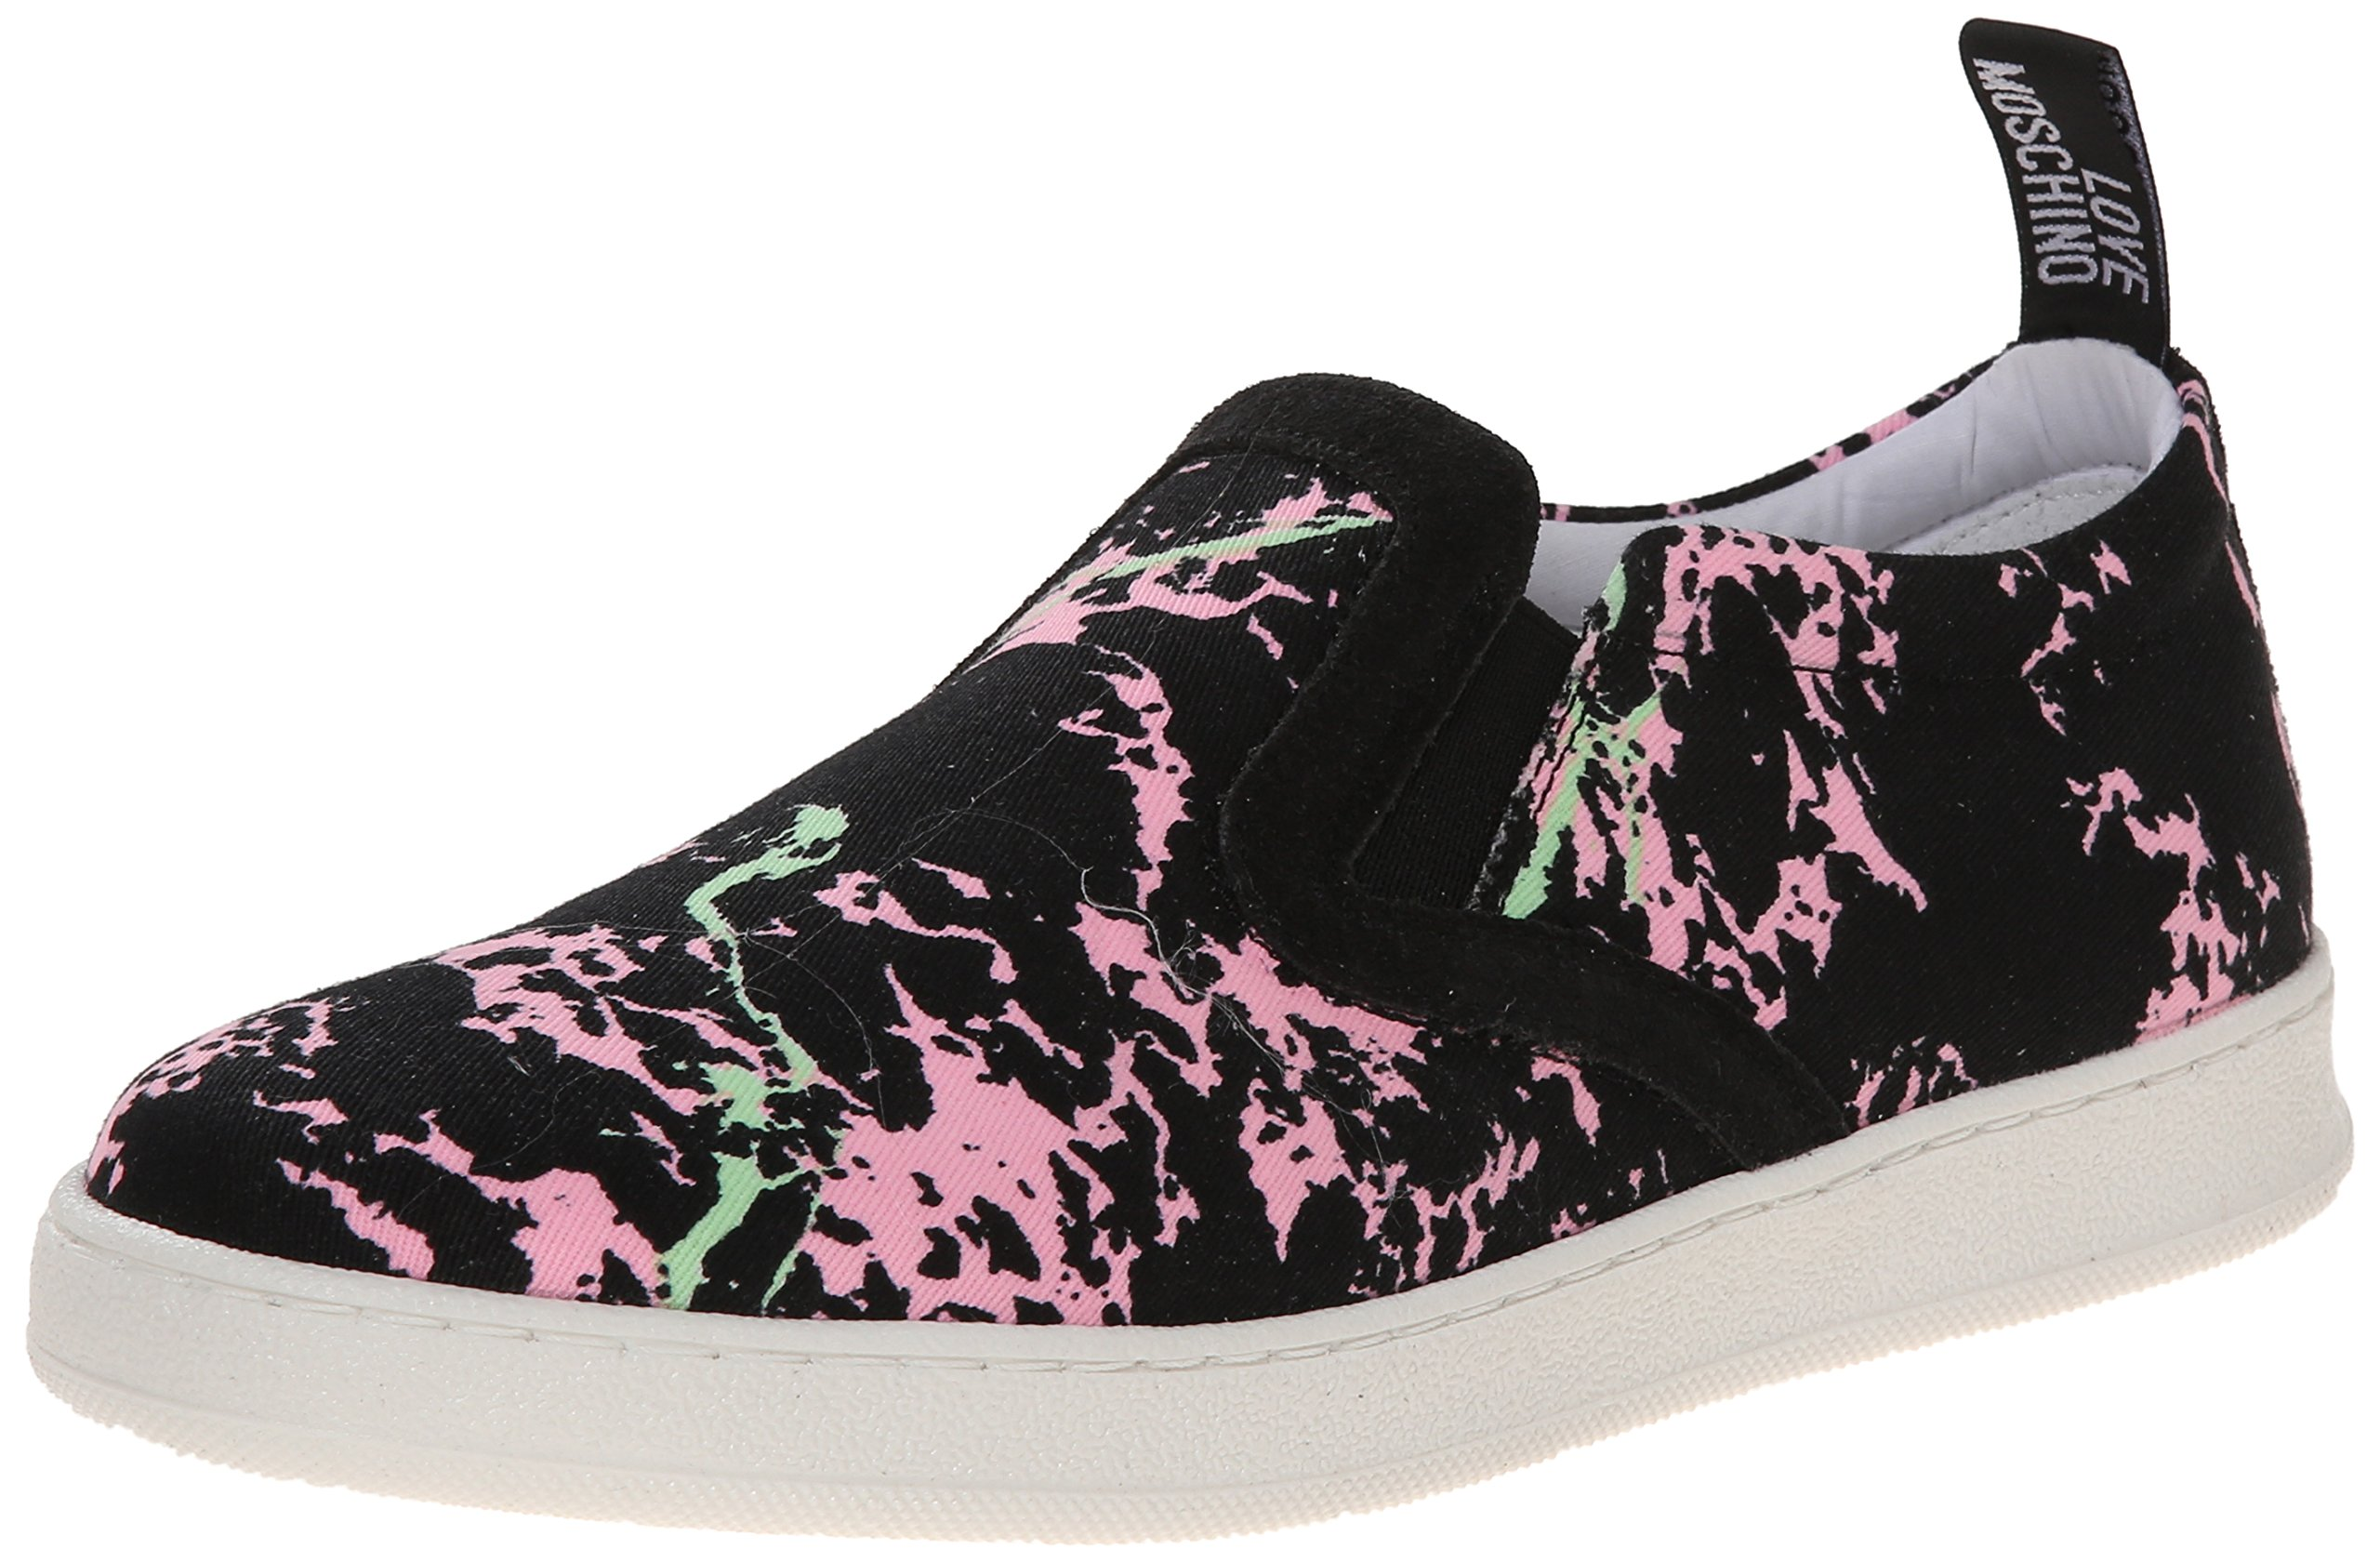 Love Moschino Women's Crakled Print High Top Fashion Sneaker, Multi, 40 BR/10 M US